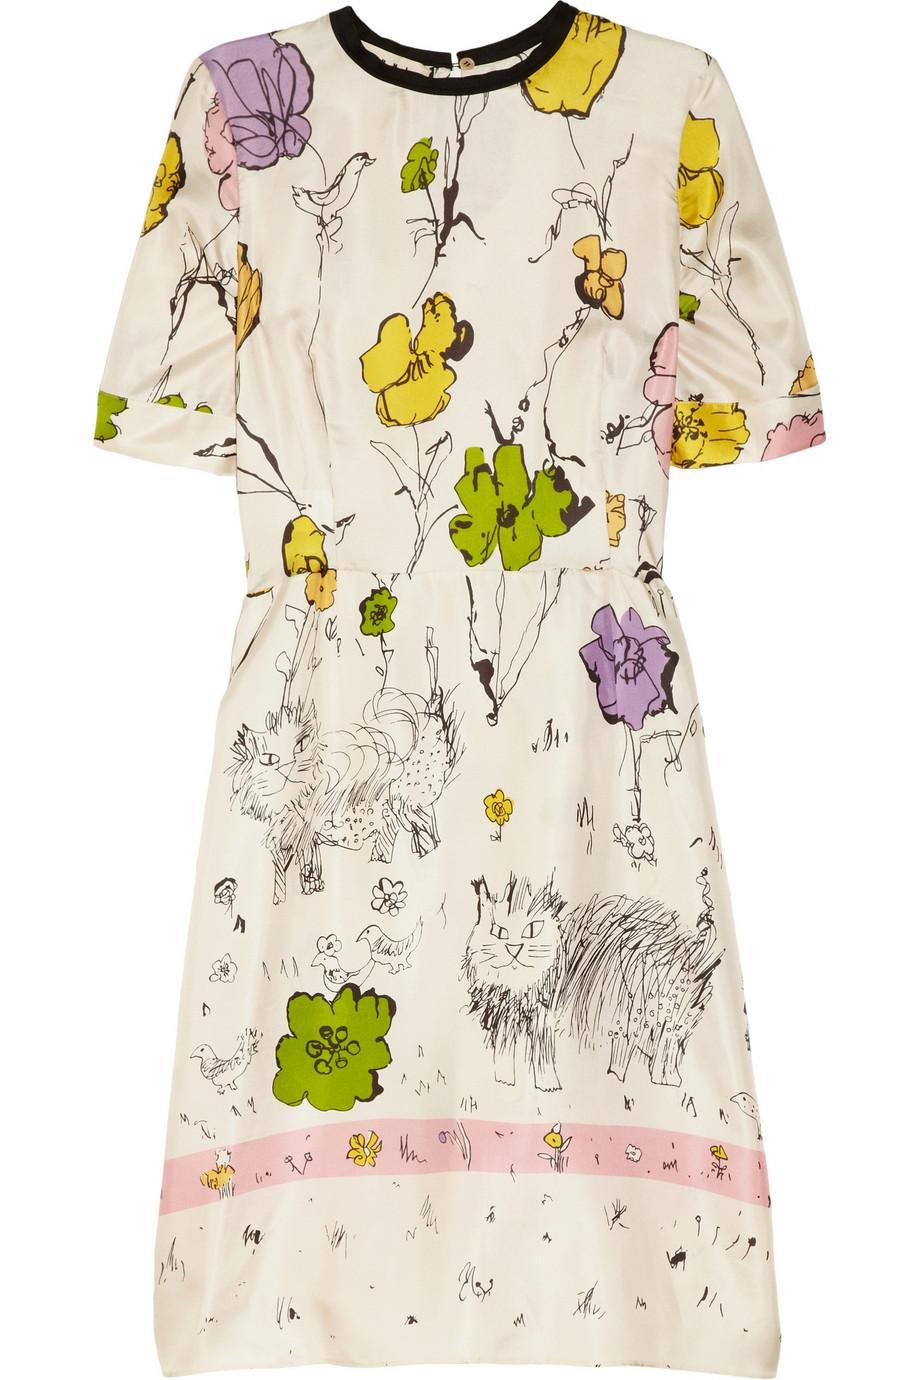 71-marni-women-s-scratchy-cat-printed-silk-twill-dress-1